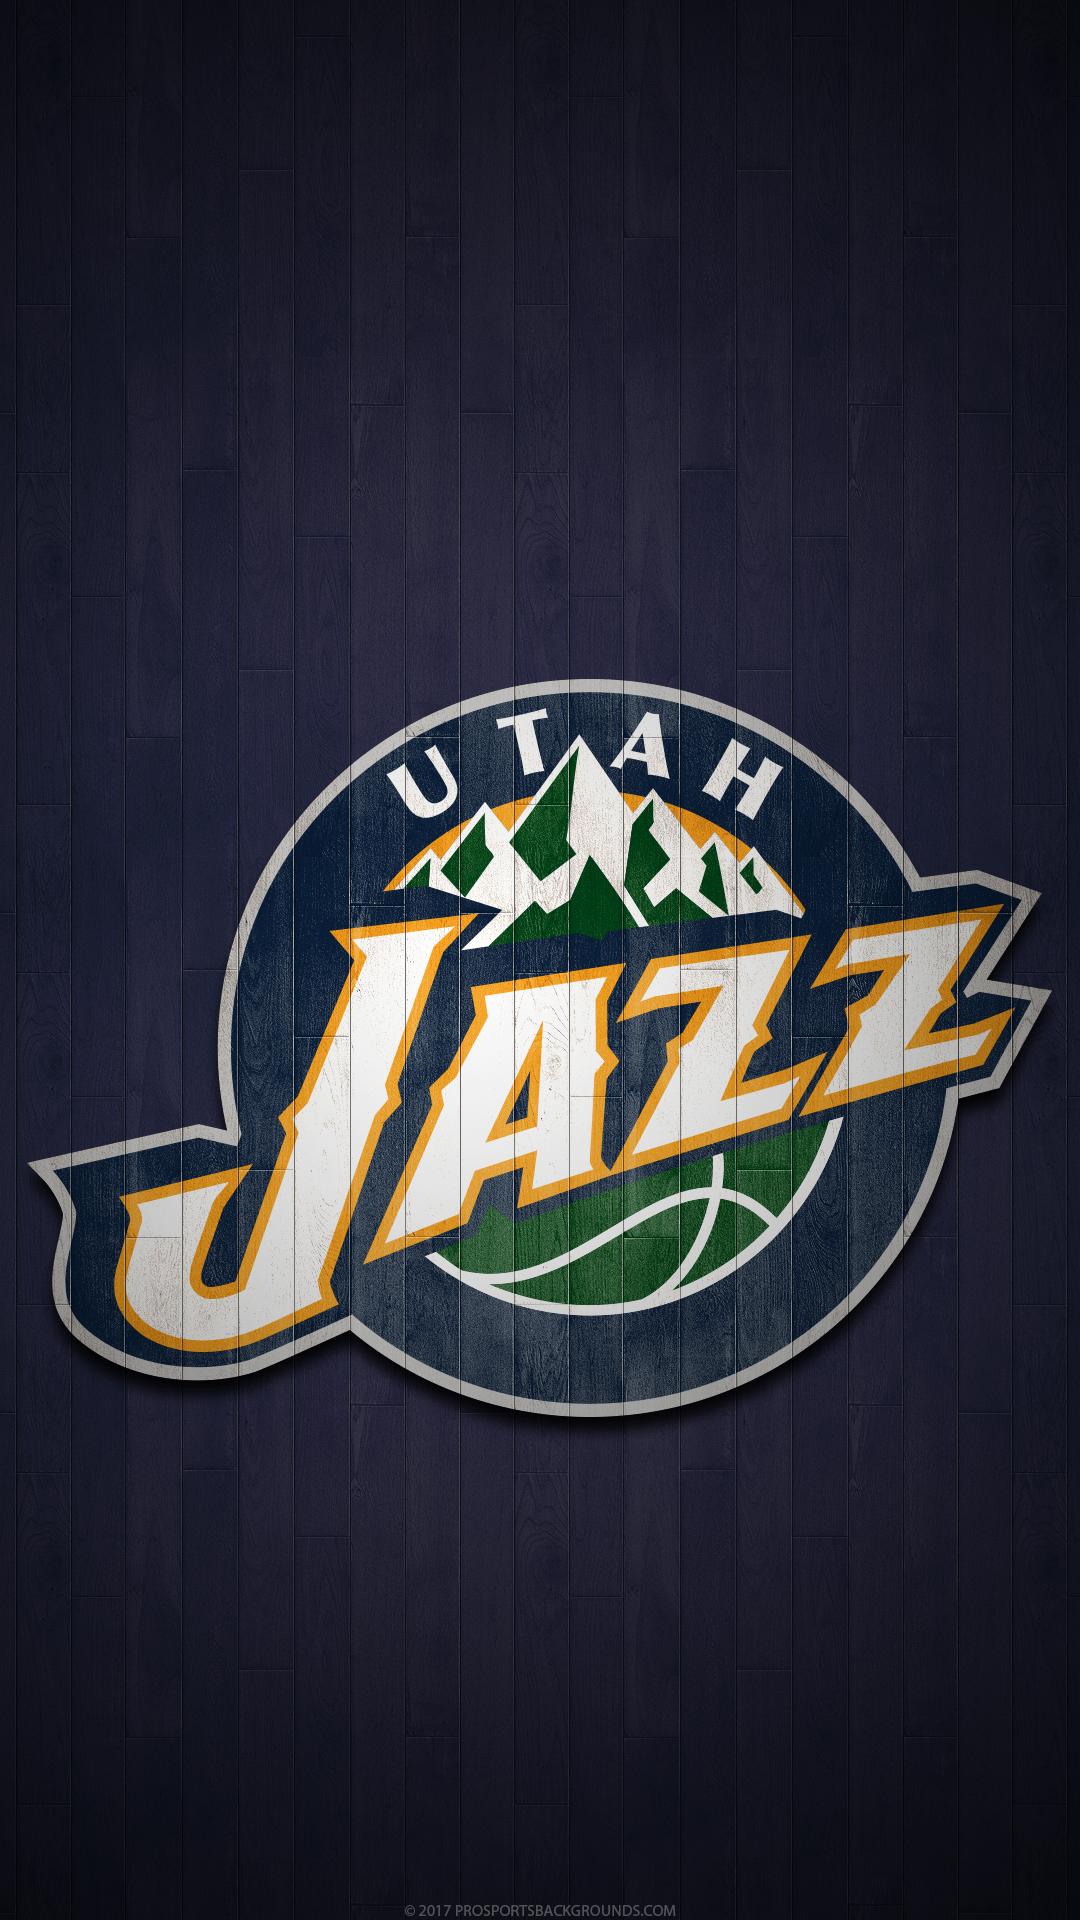 Logo Basketball Wallpaper Hd In 2020 Basketball Wallpaper Basketball Wallpapers Hd Logo Basketball